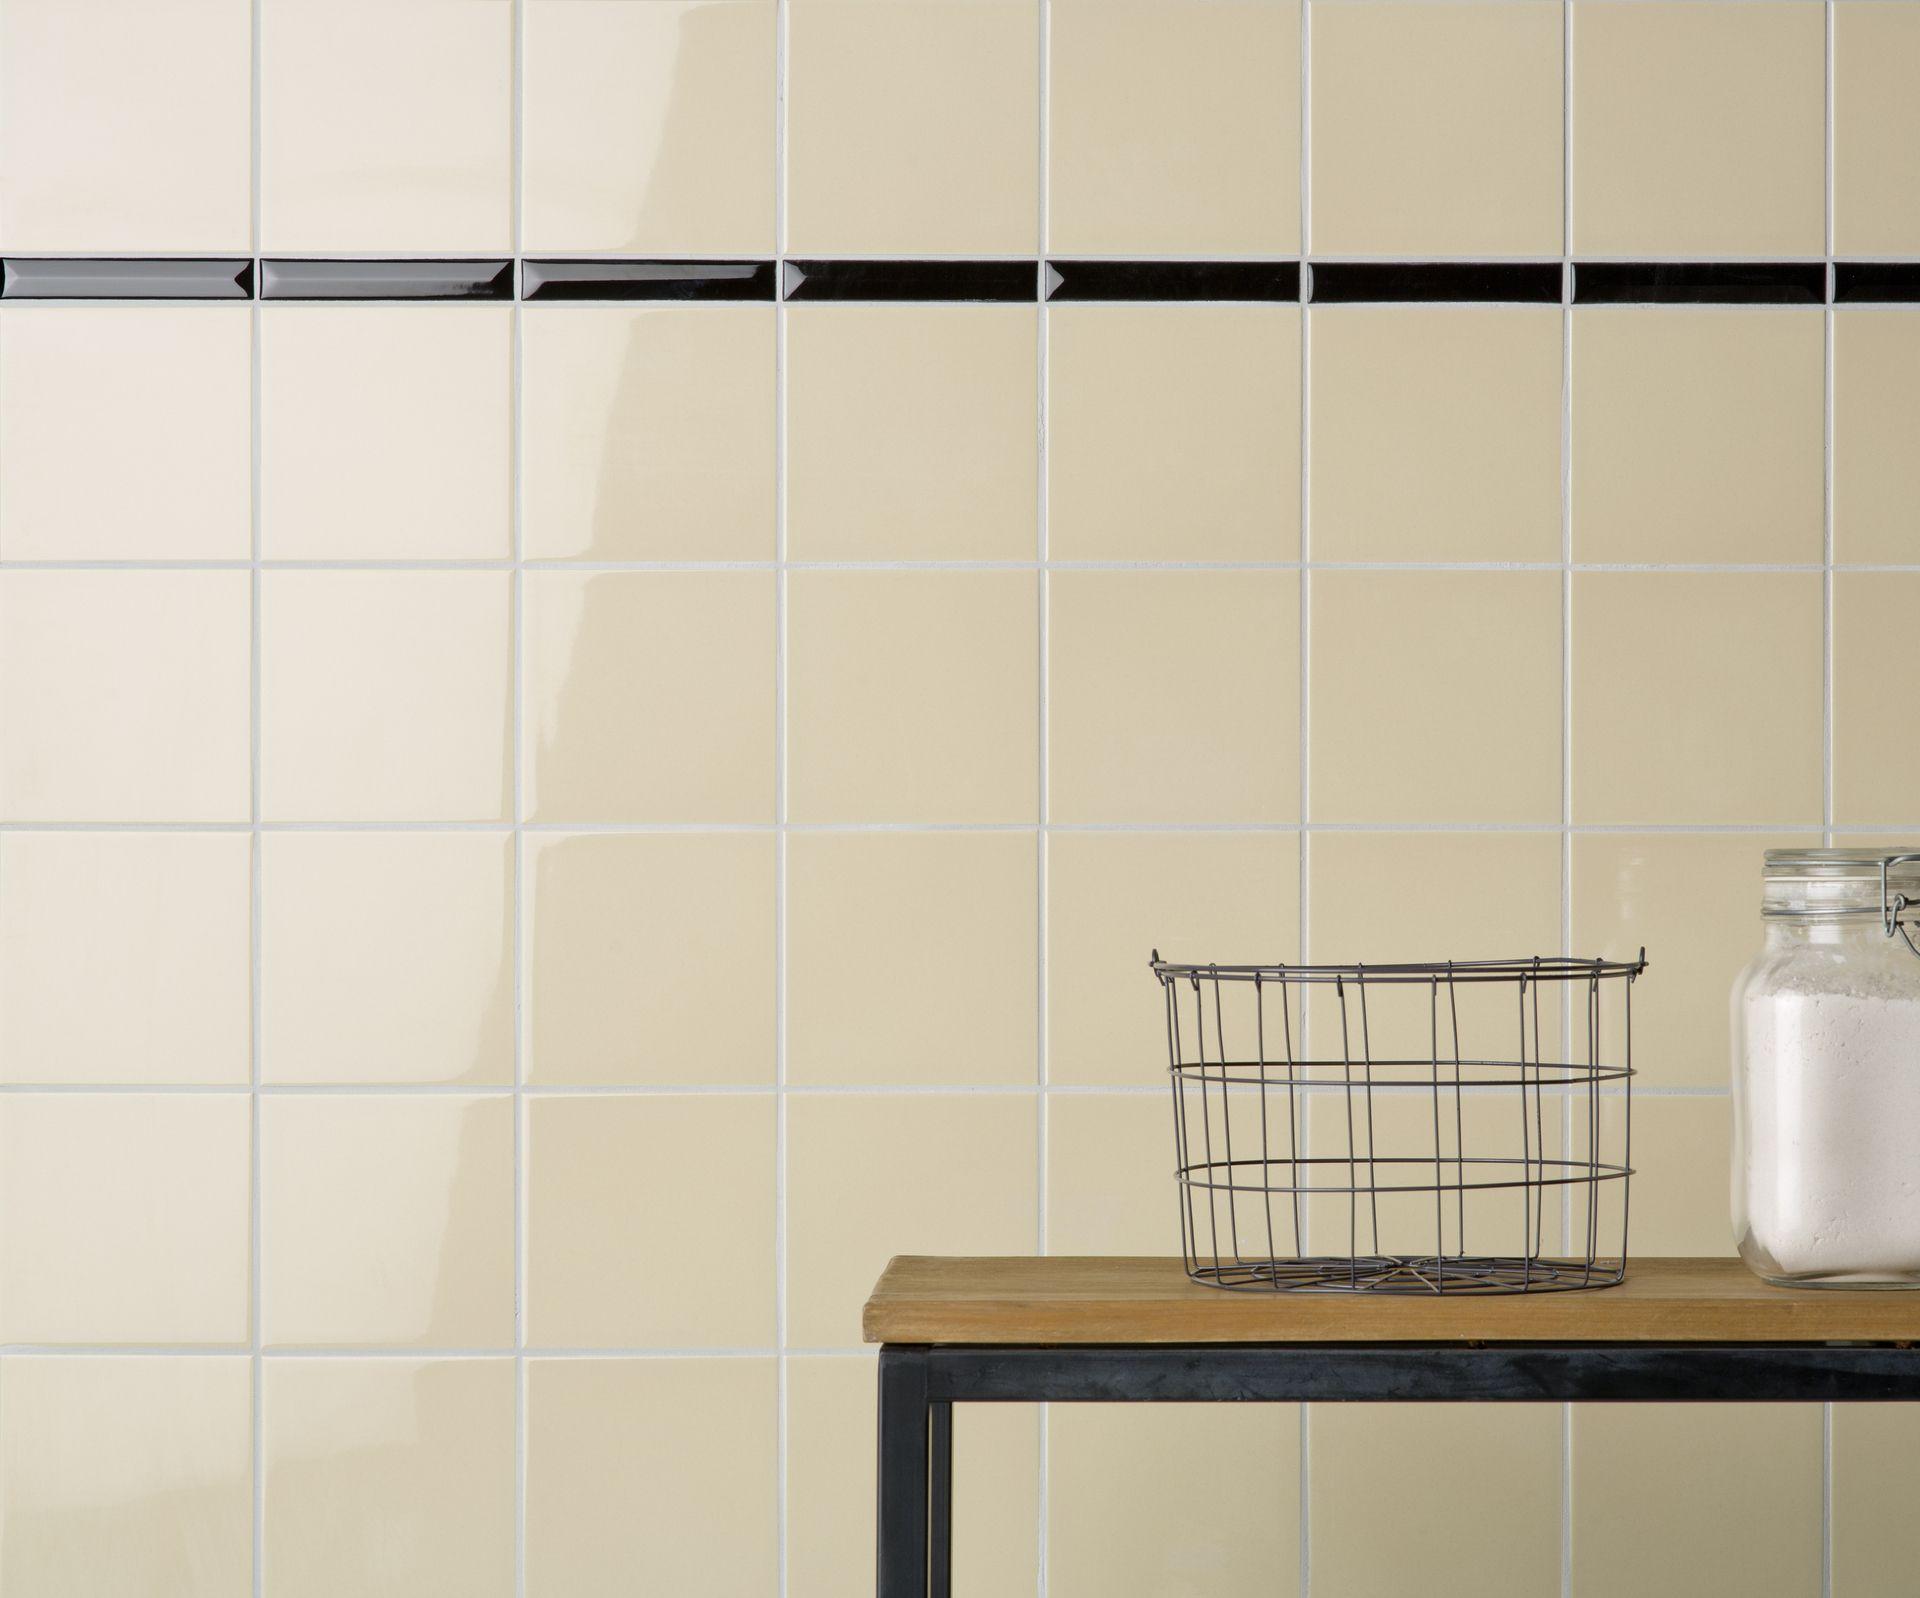 mosa classics fliesenserien f r die wand ais. Black Bedroom Furniture Sets. Home Design Ideas